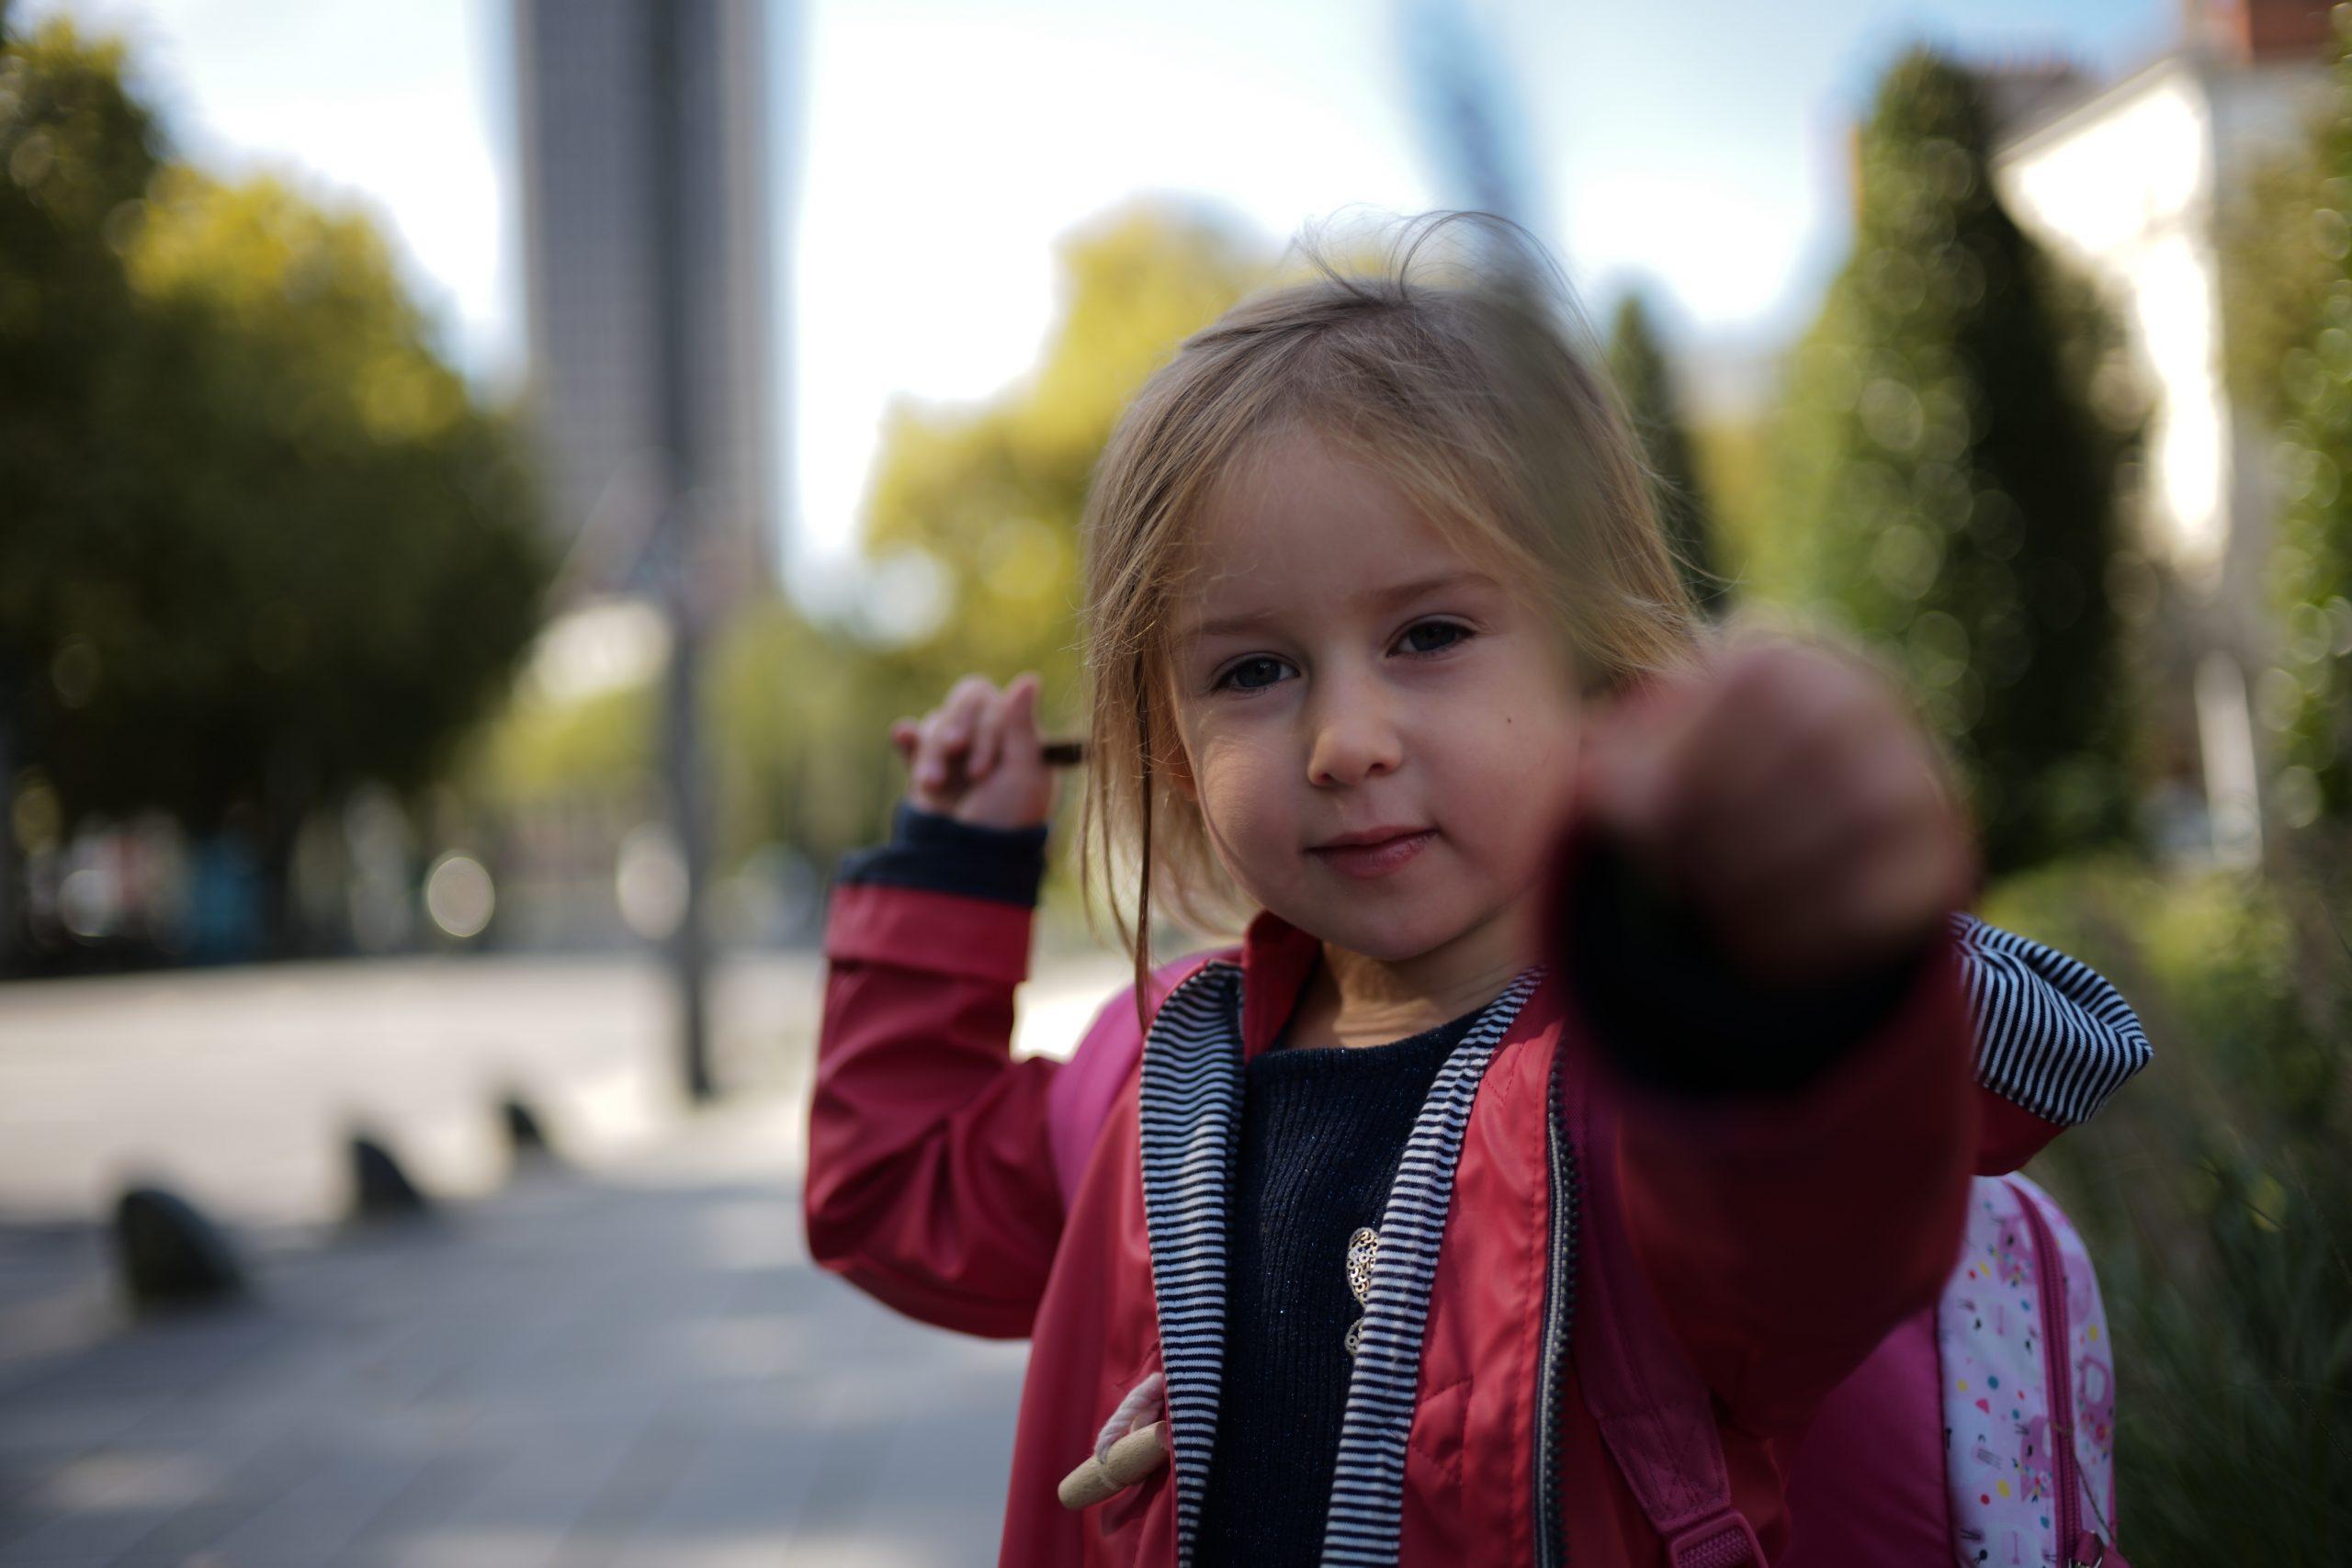 Town center of Nantes - Leica M10, 35mm summilux